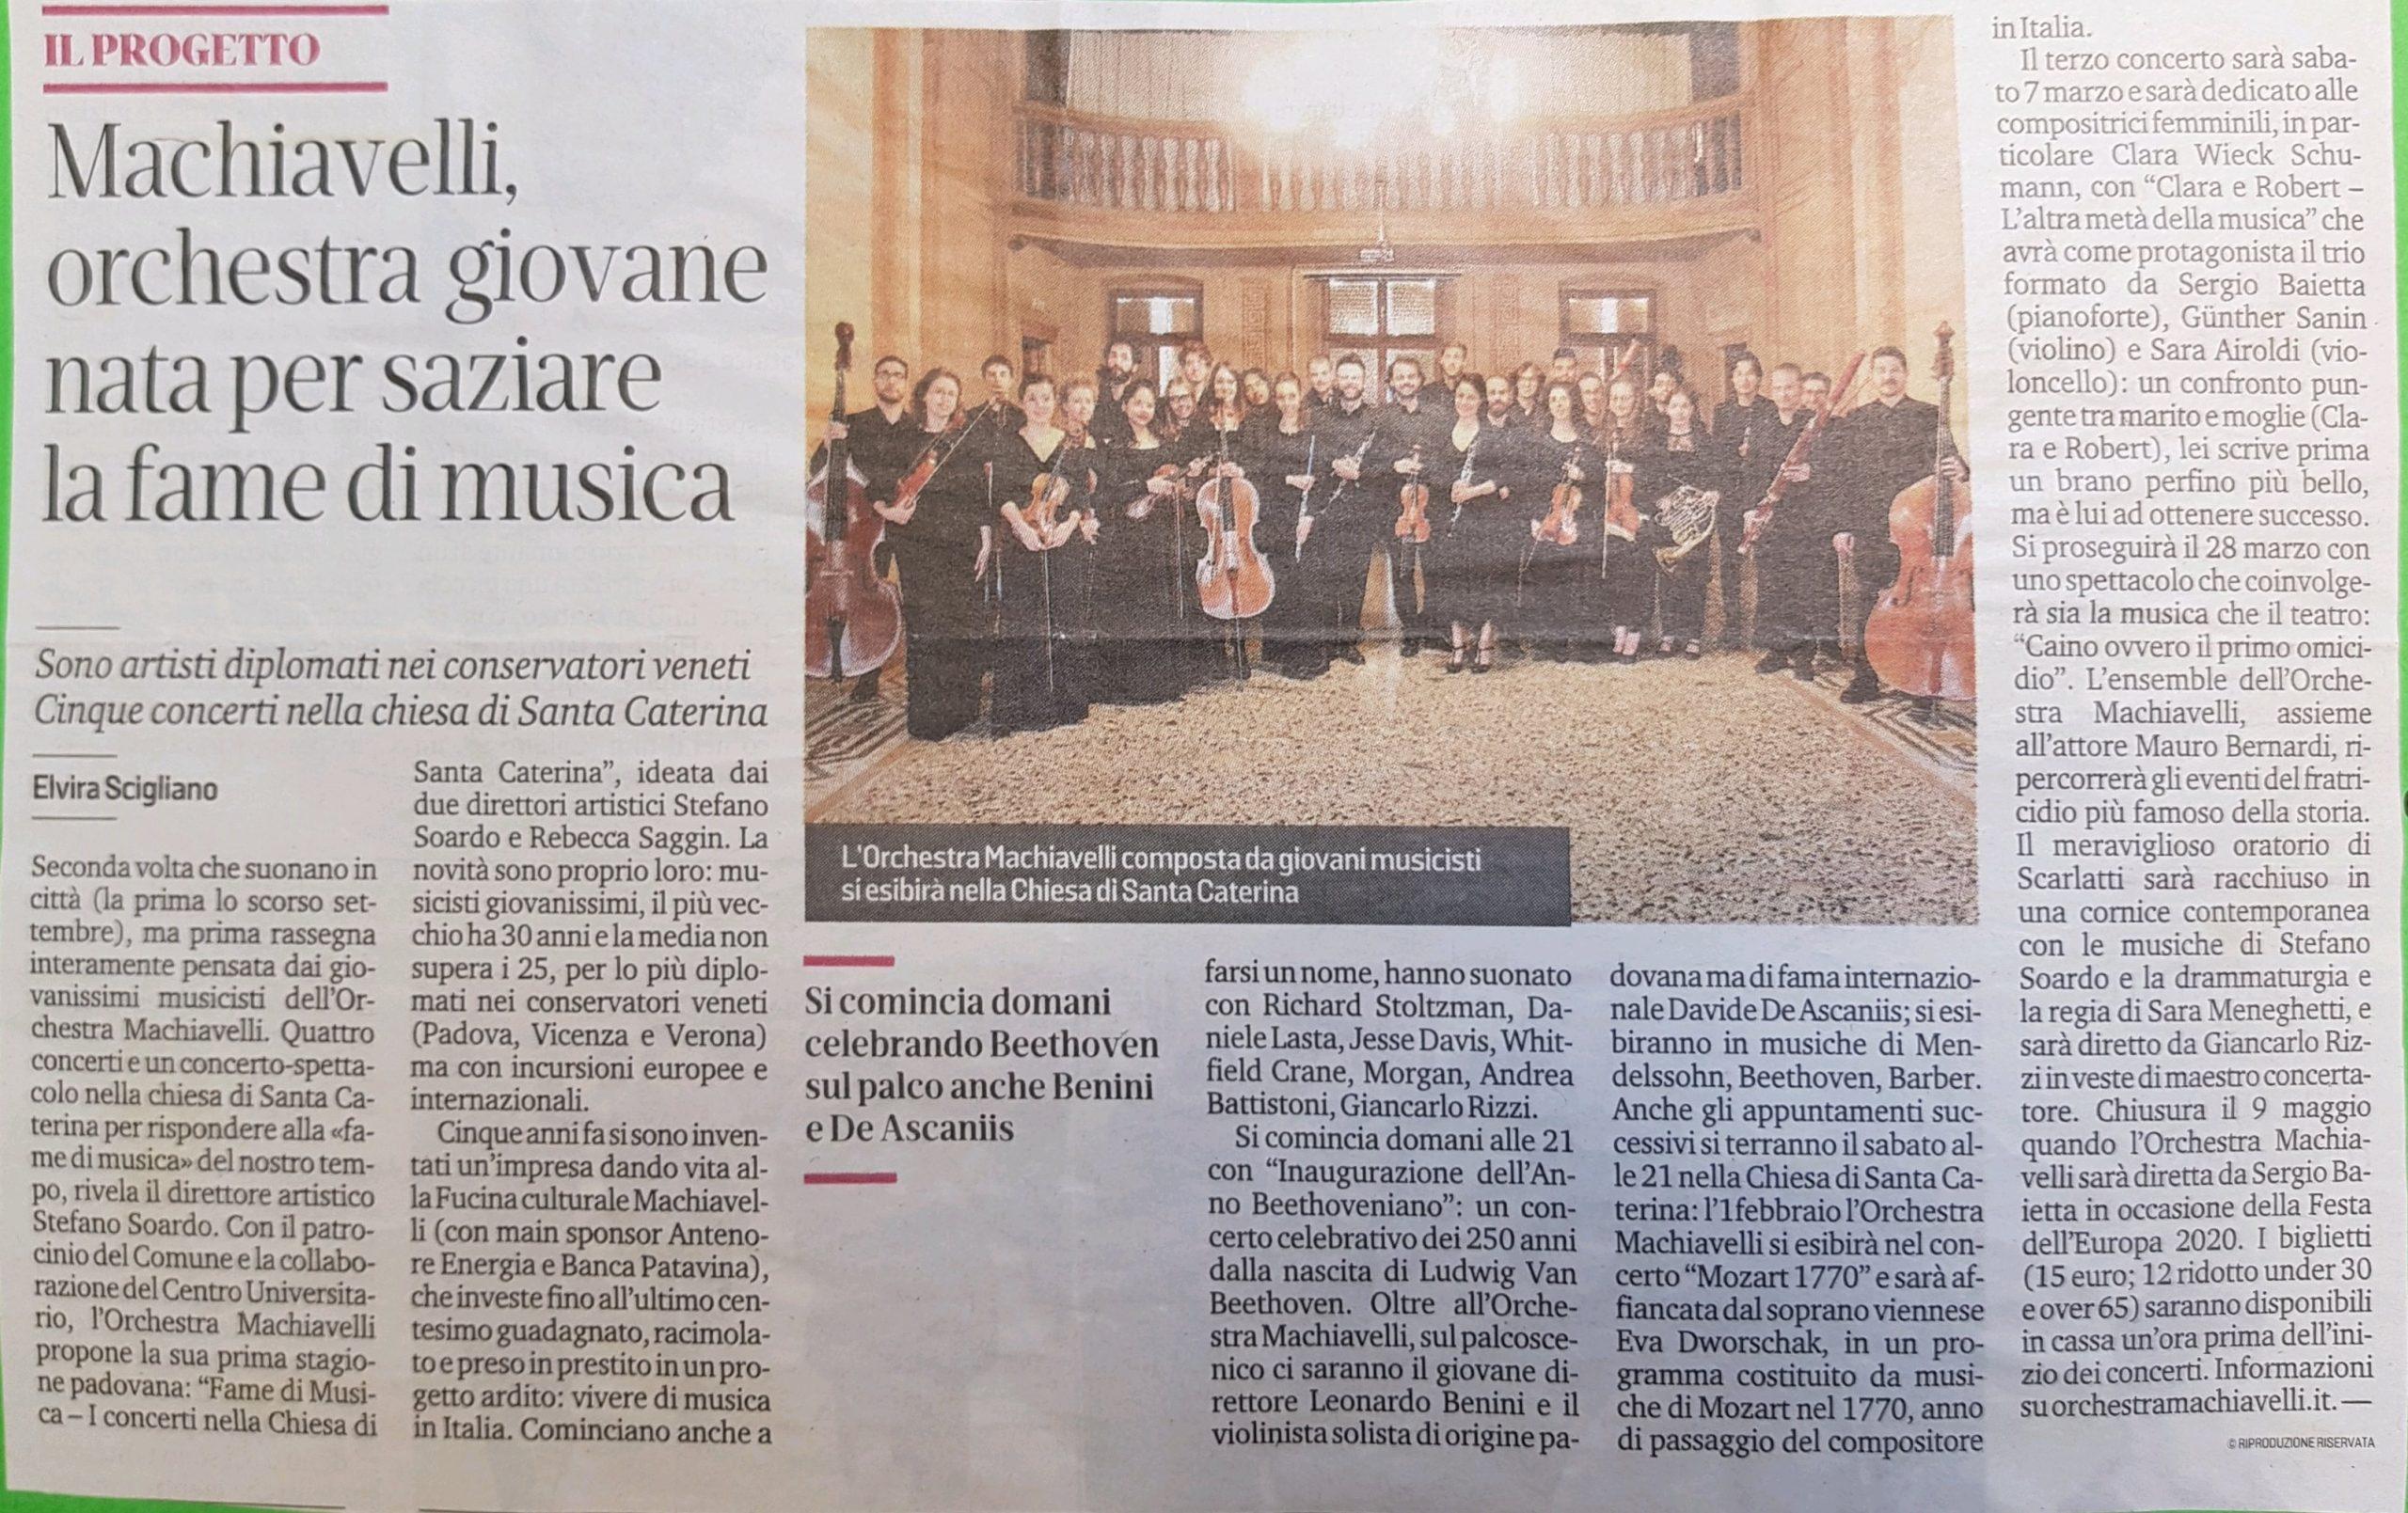 rassegna-stampa-orchestra-machiavelli-verona-padova